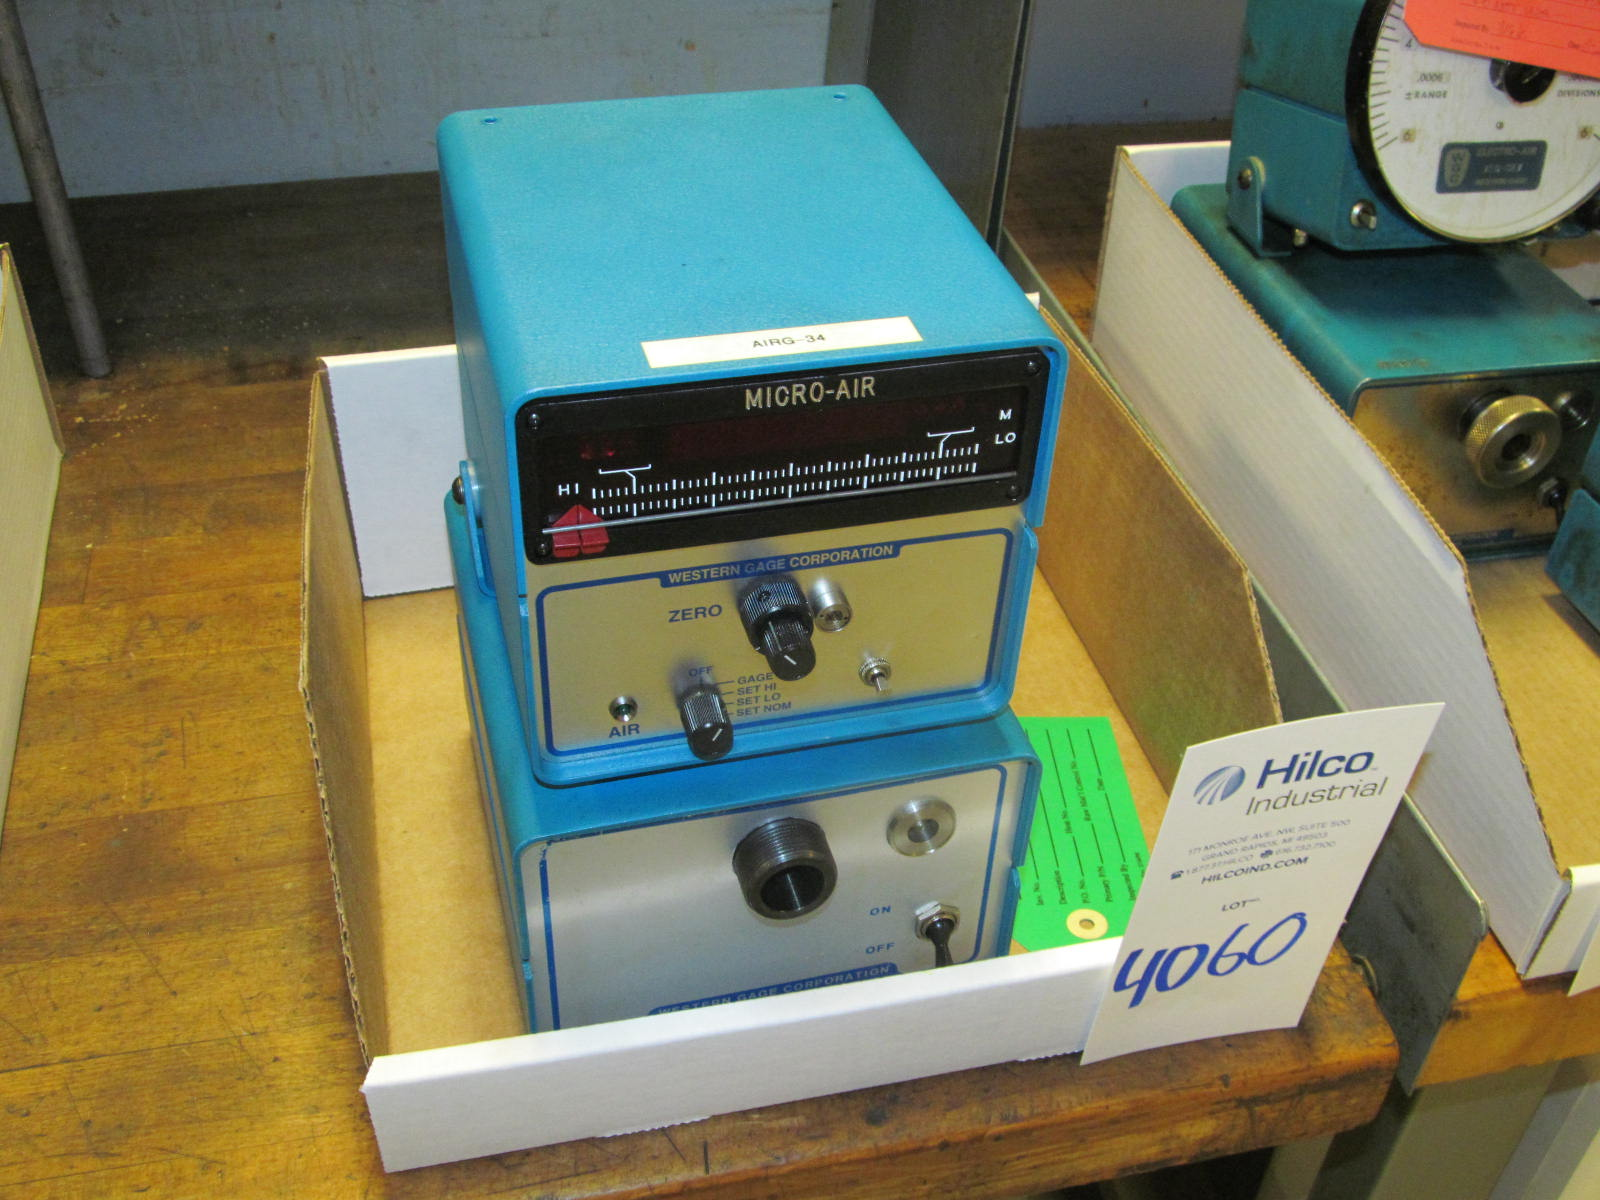 Western Gage Model Micro Air Digital Air Comparator